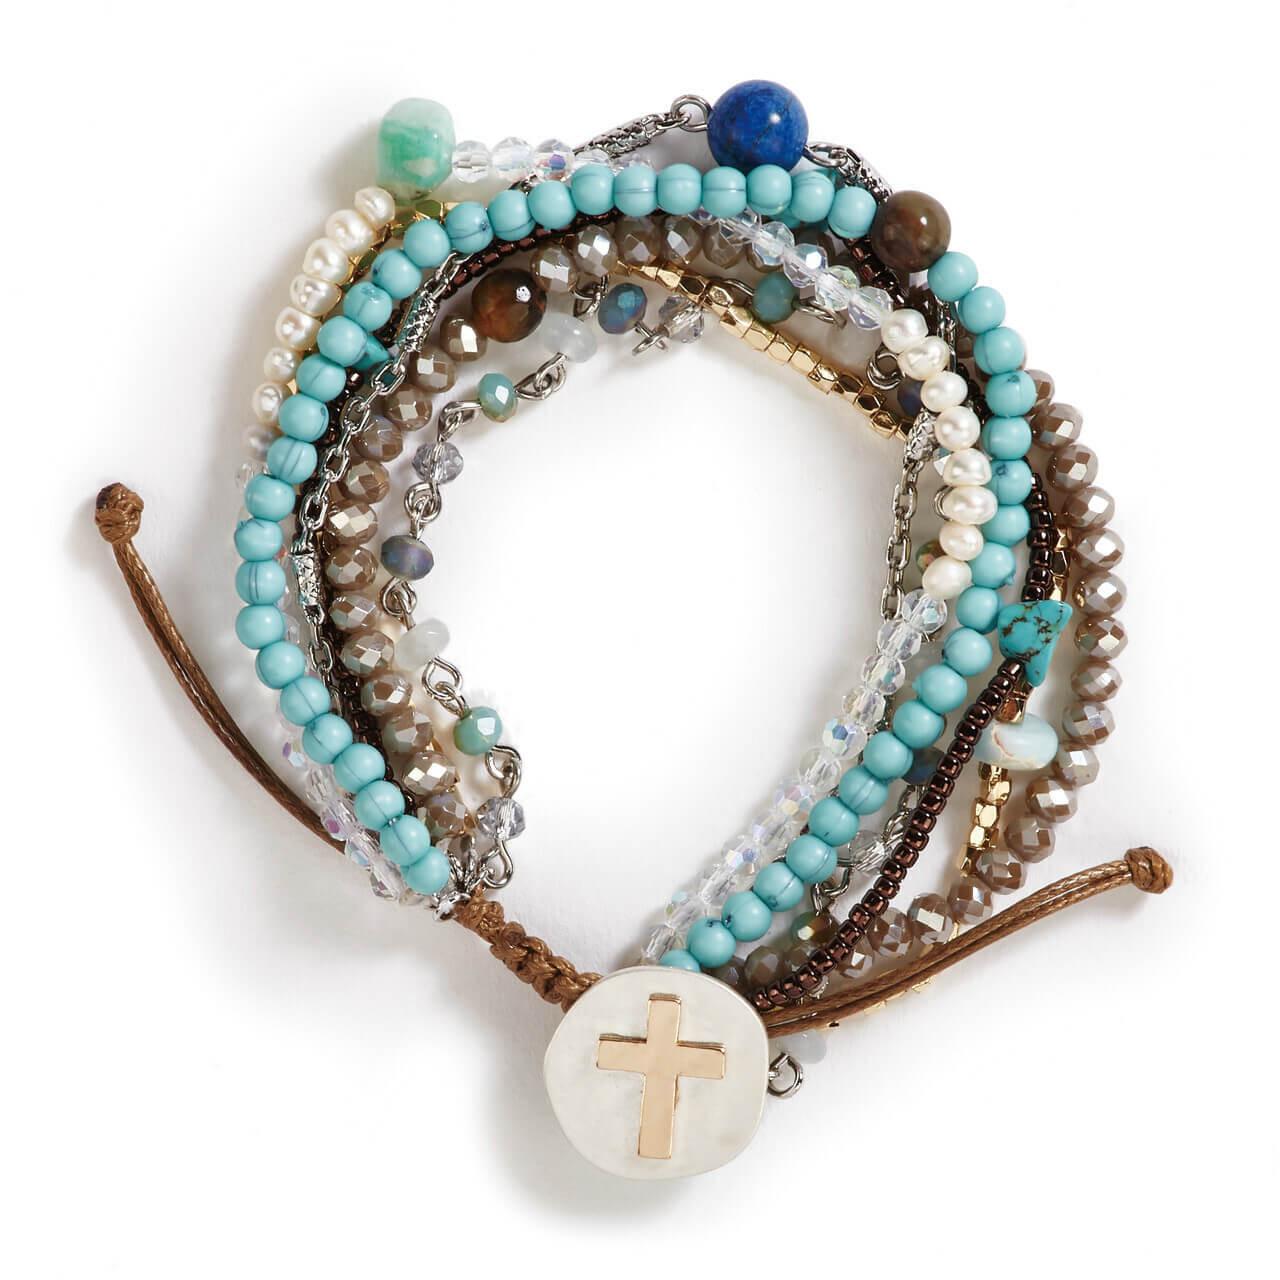 A lot happens in seven days prayer bracelet turquoise